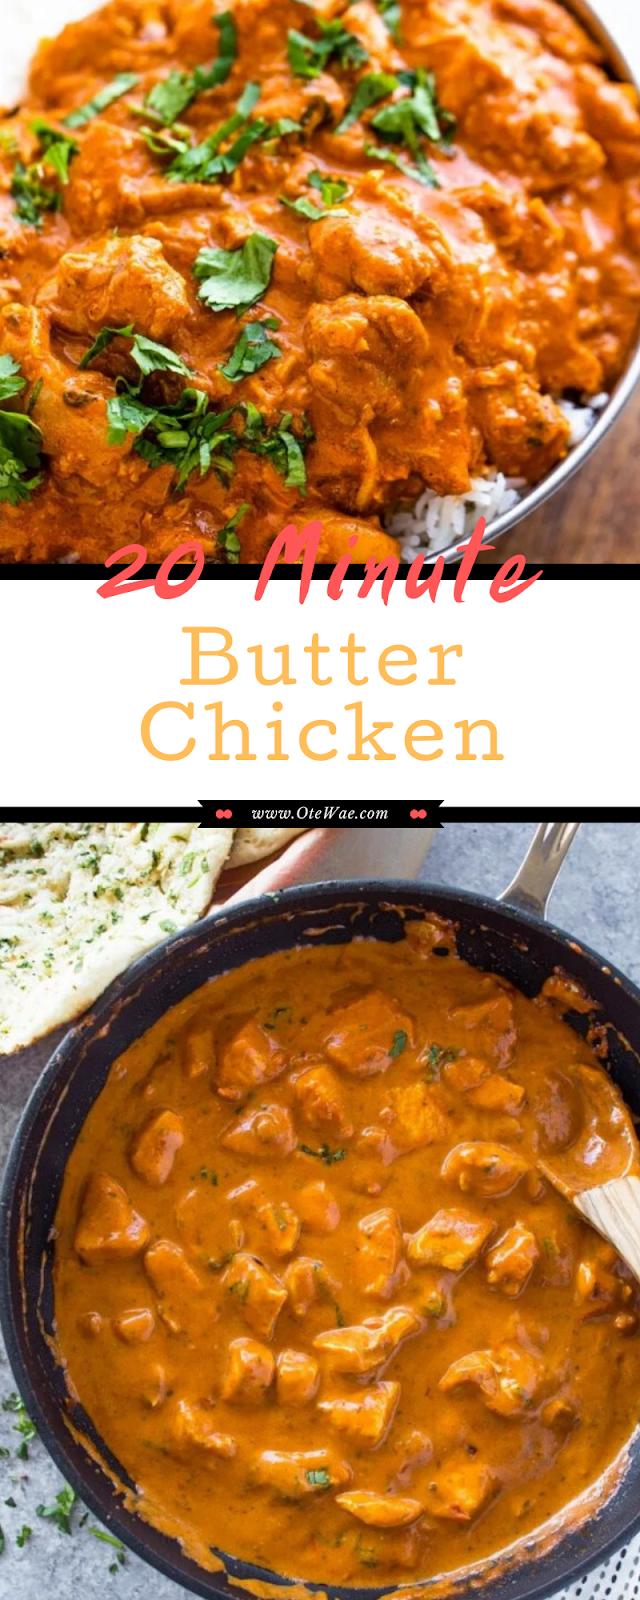 20 Minute Butter Chicken